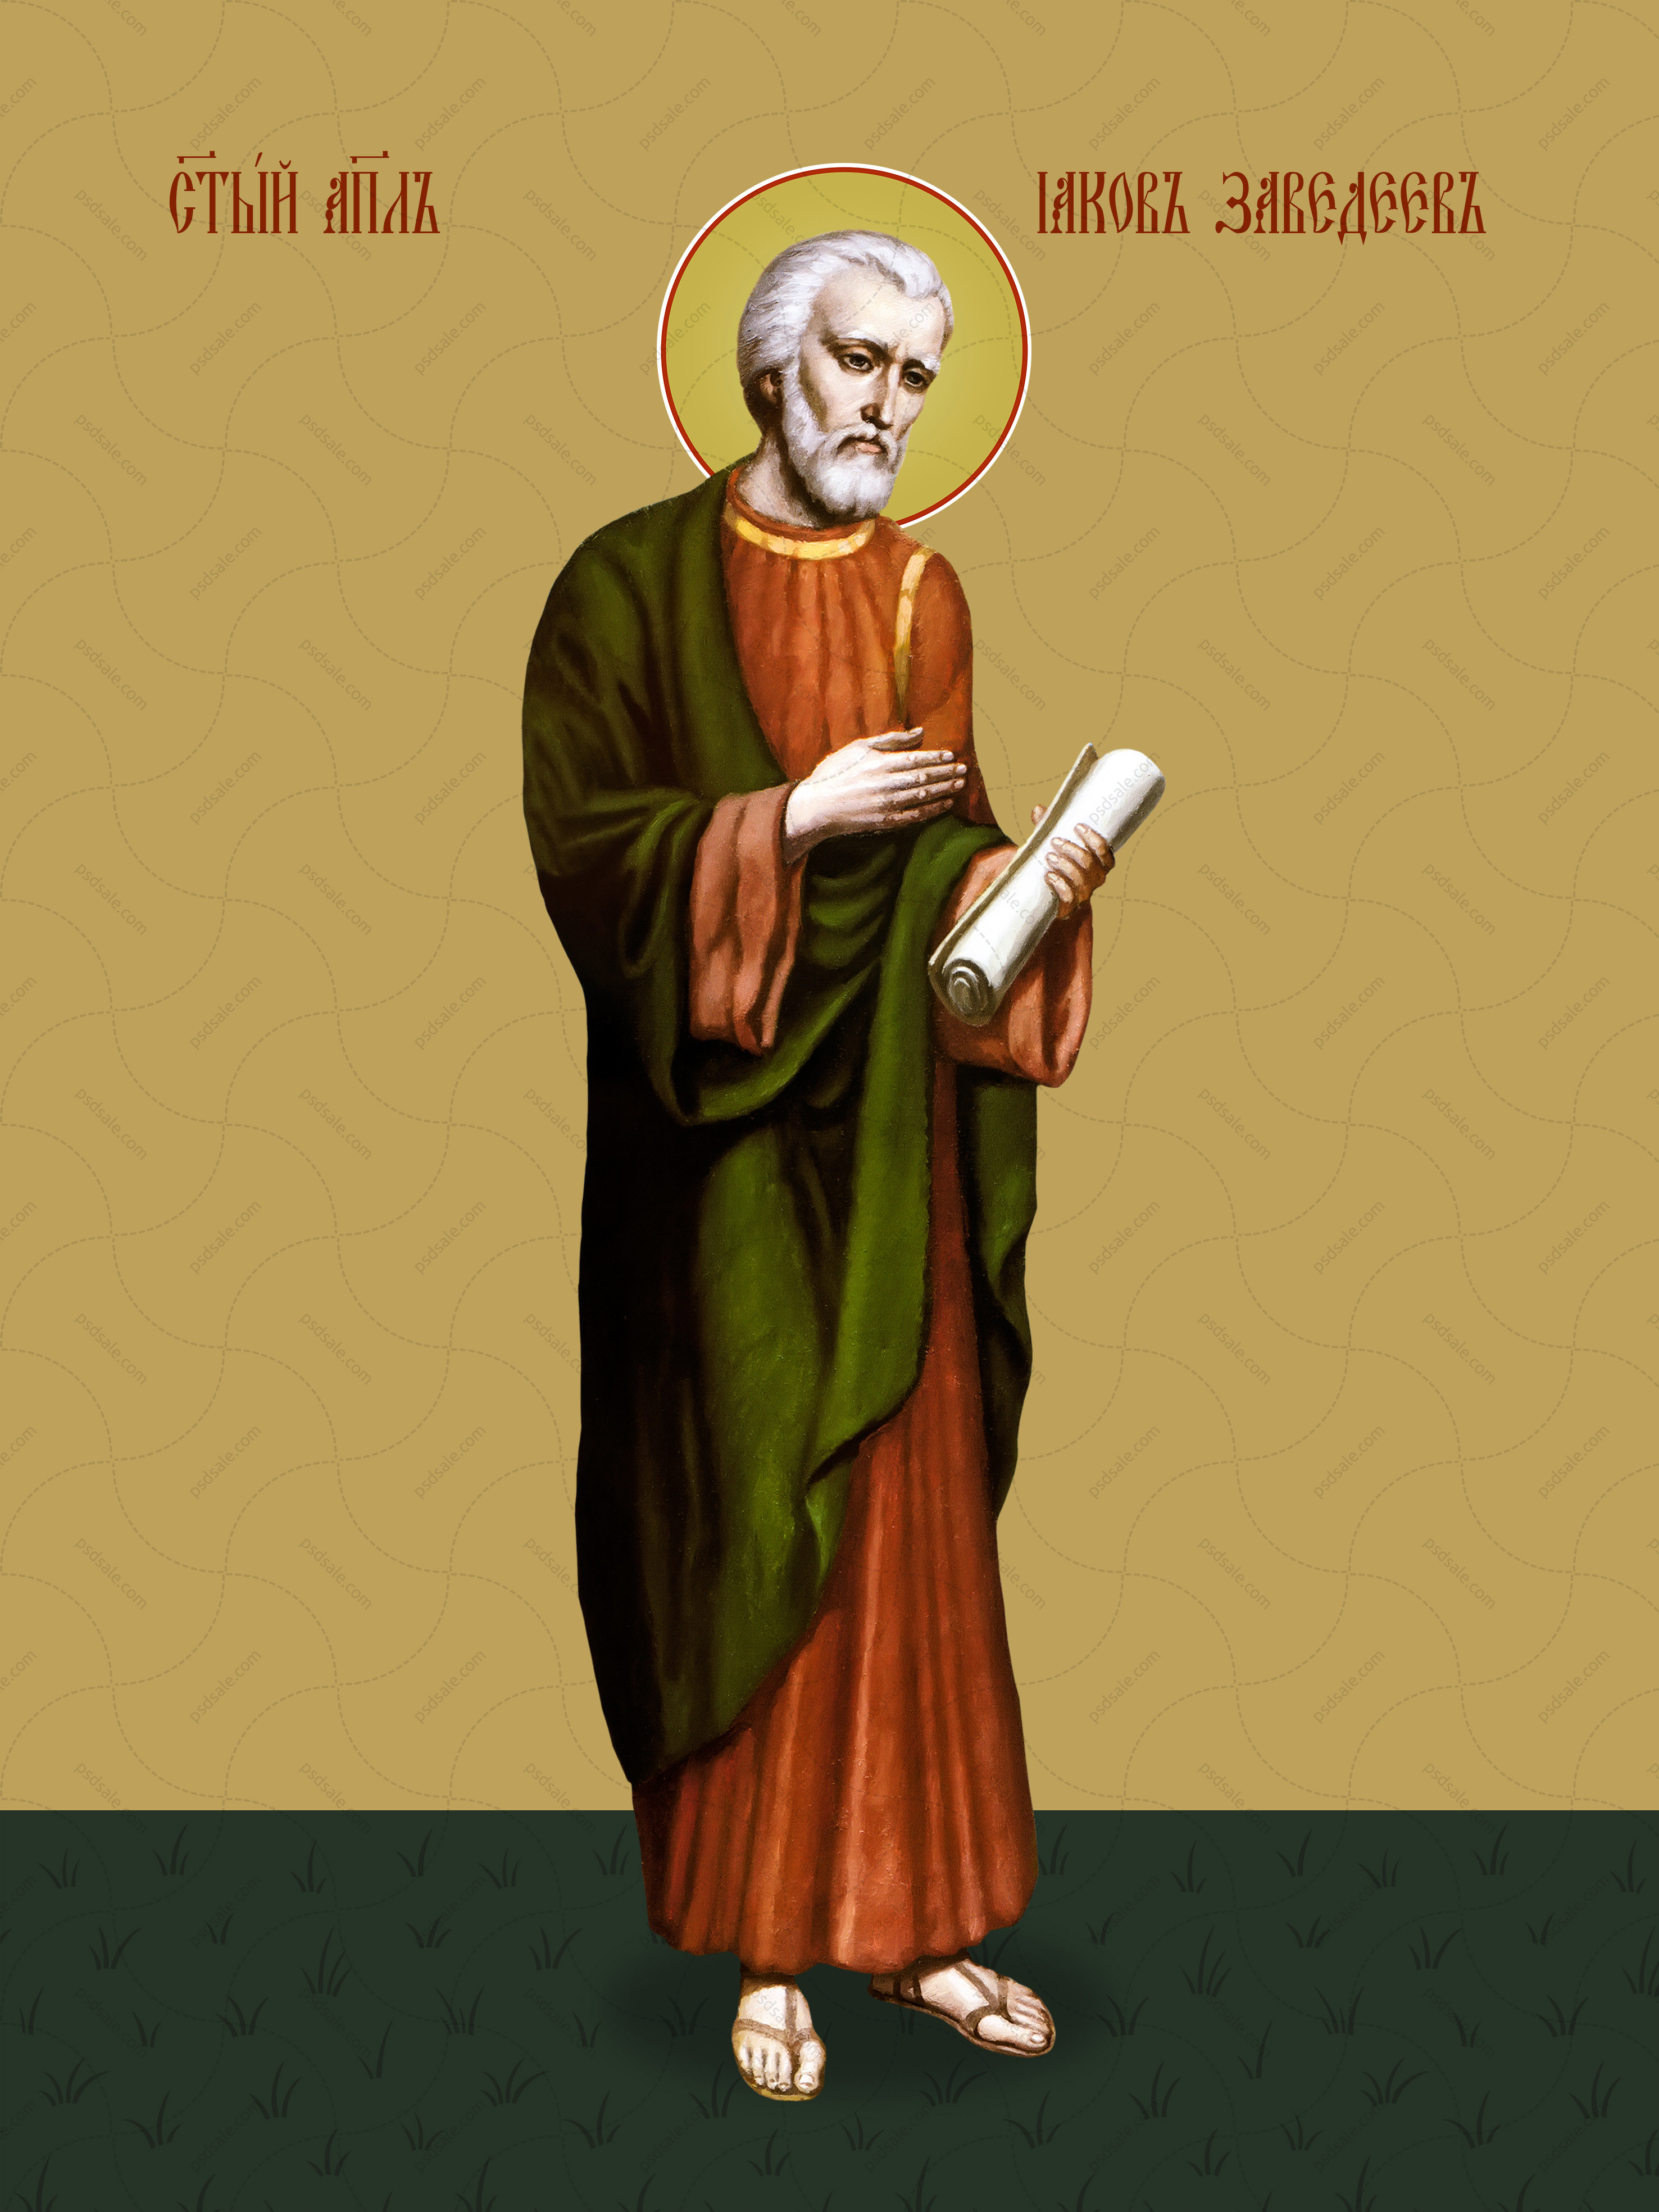 Иаков Заведеев, апостол